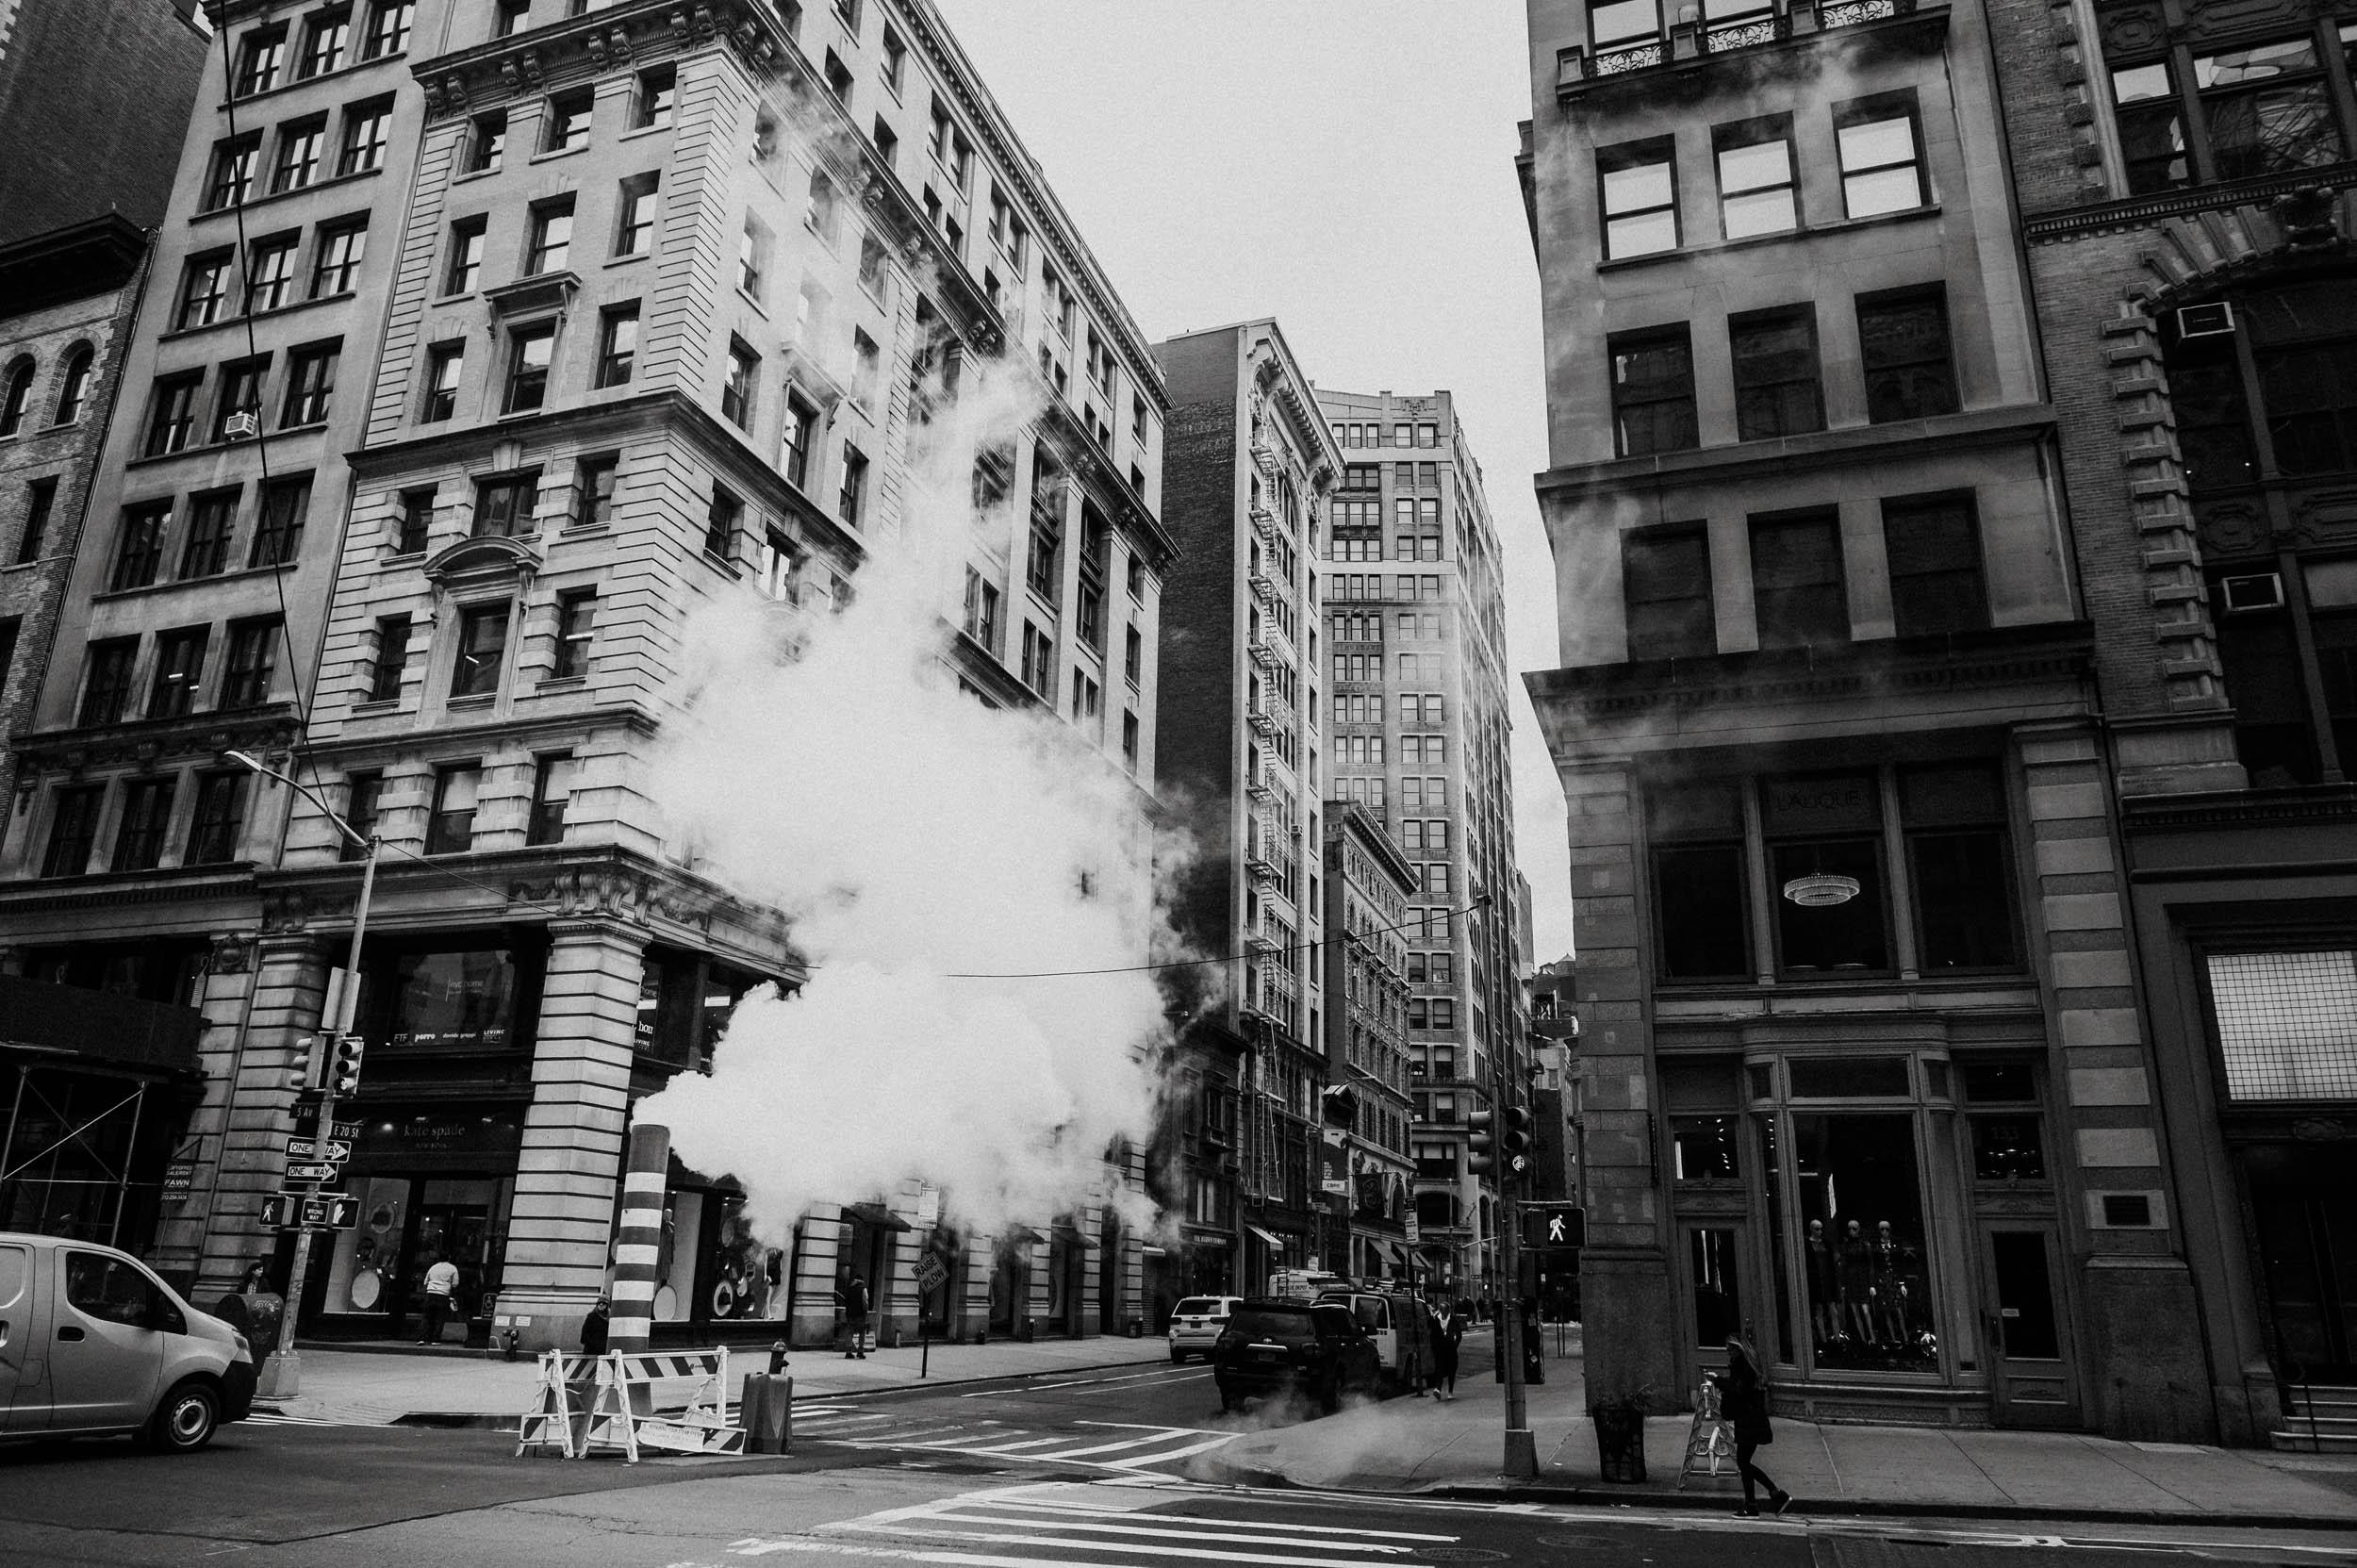 NYC-LoRes-1.jpg